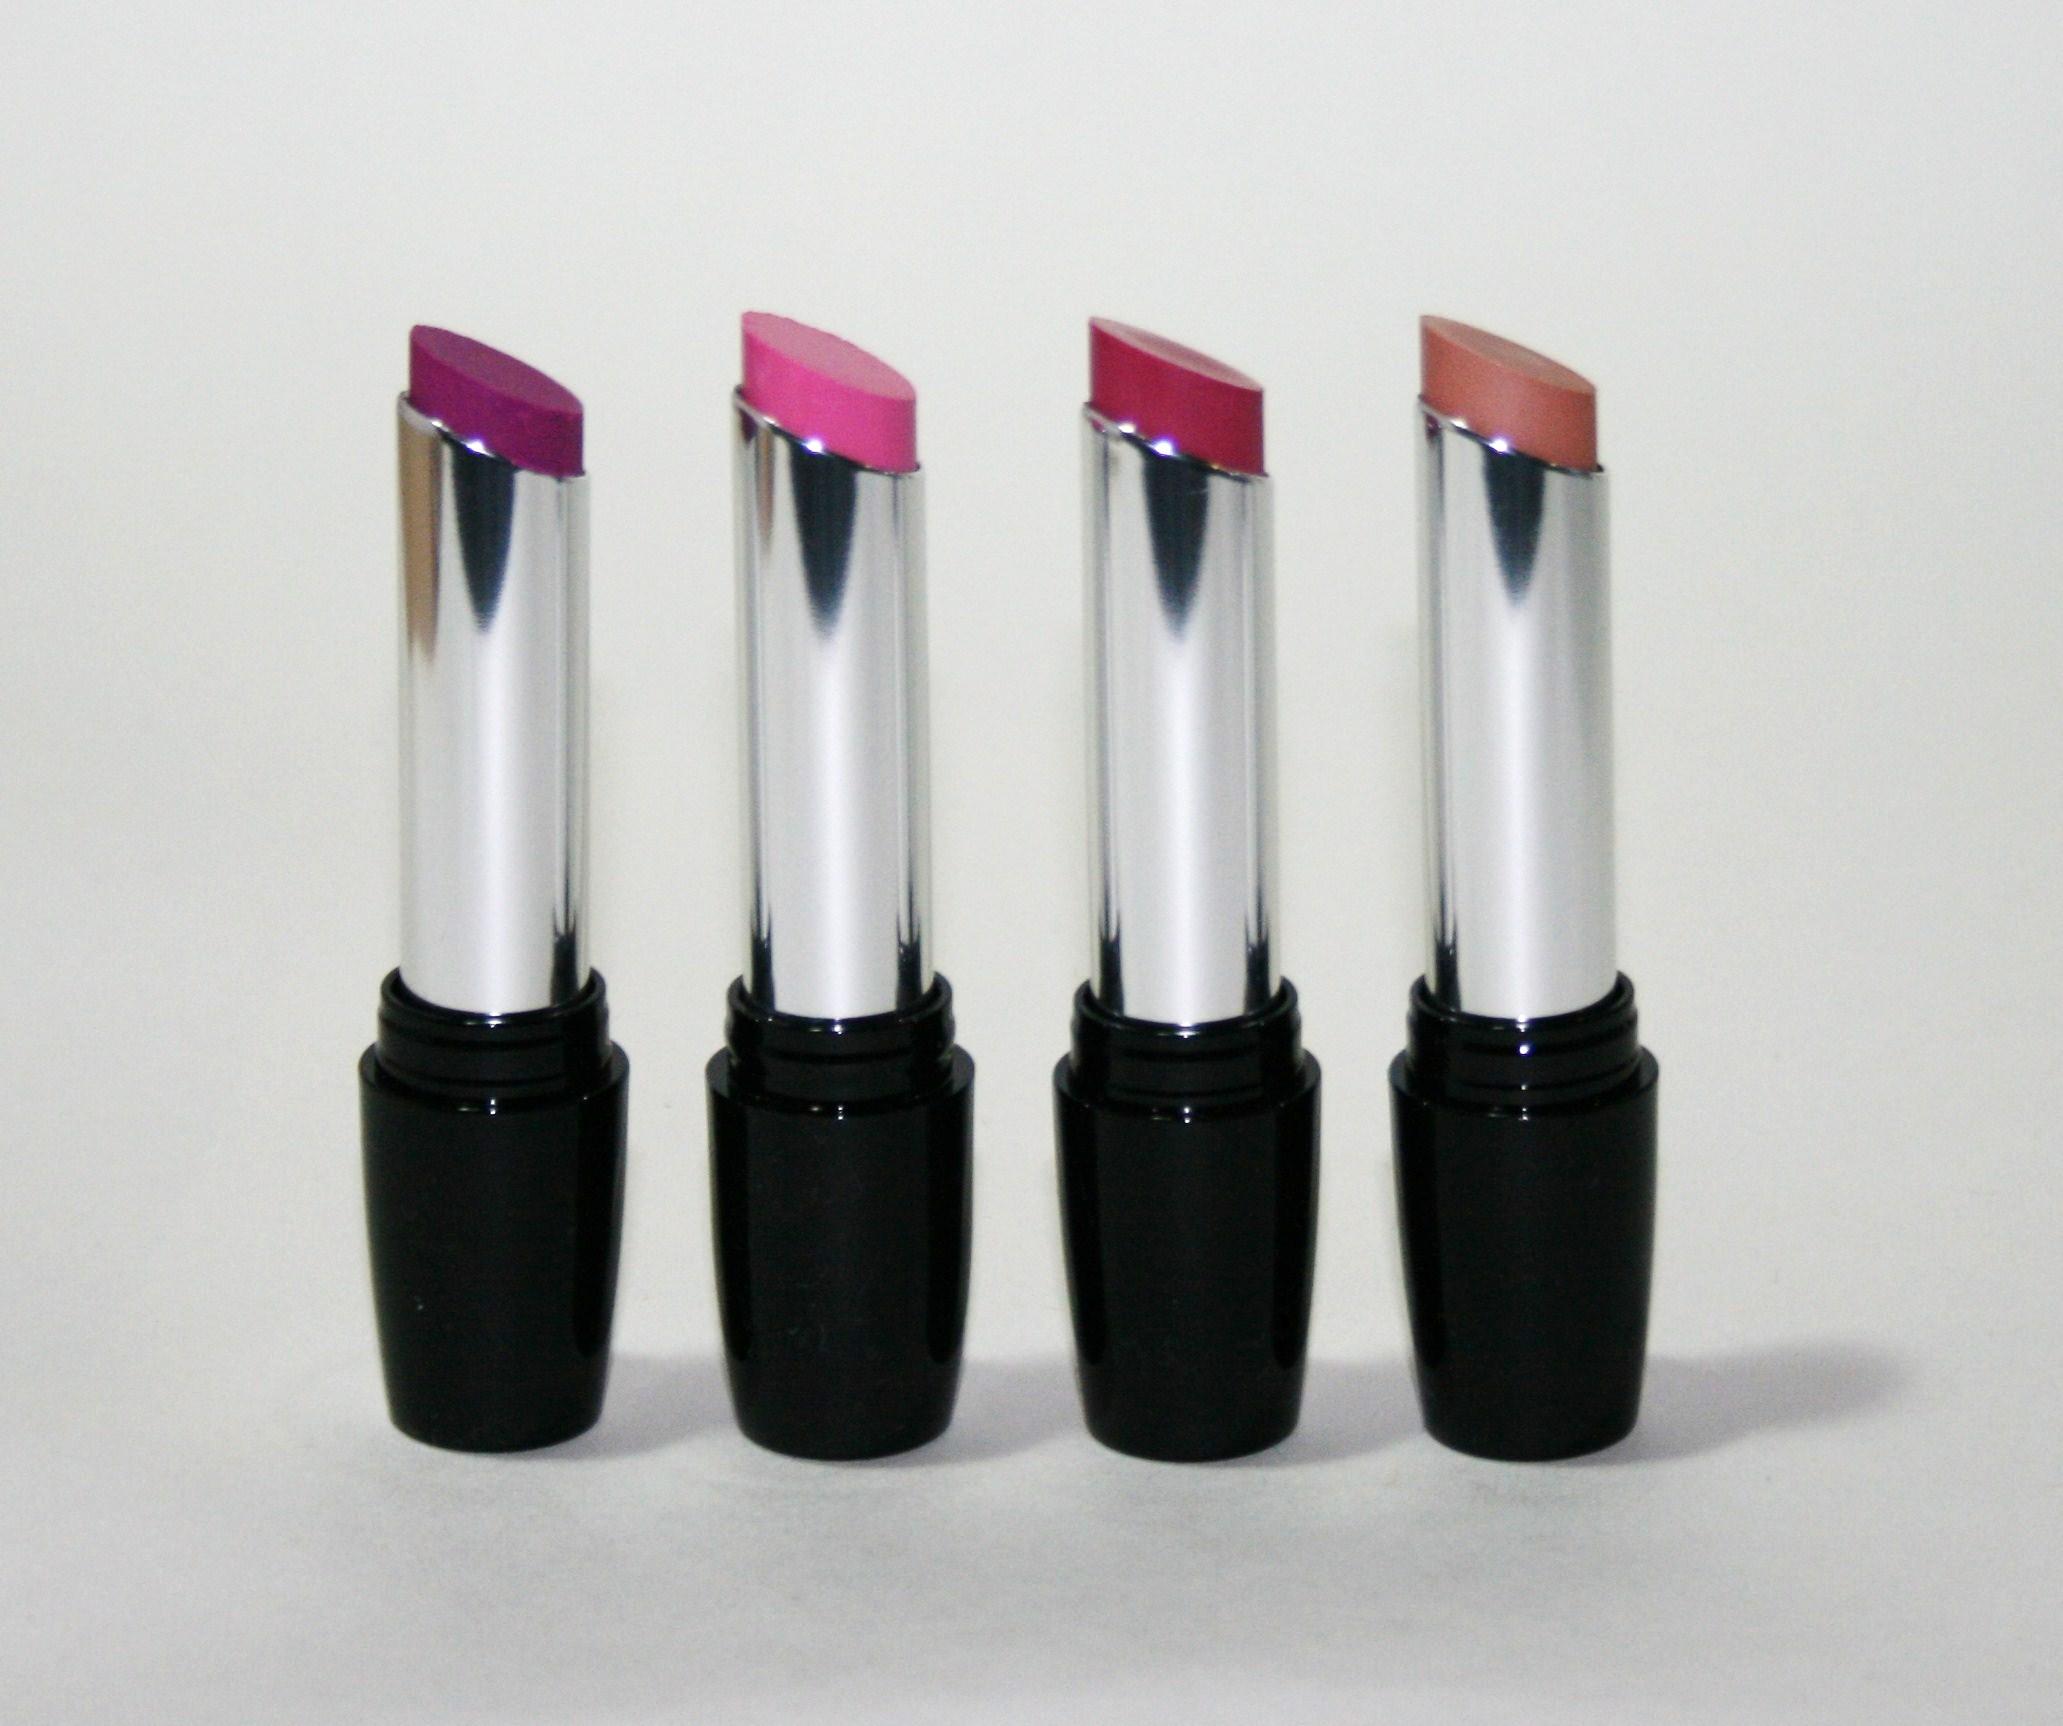 Avon Ultra Colour Indulgence Lipsticks Review